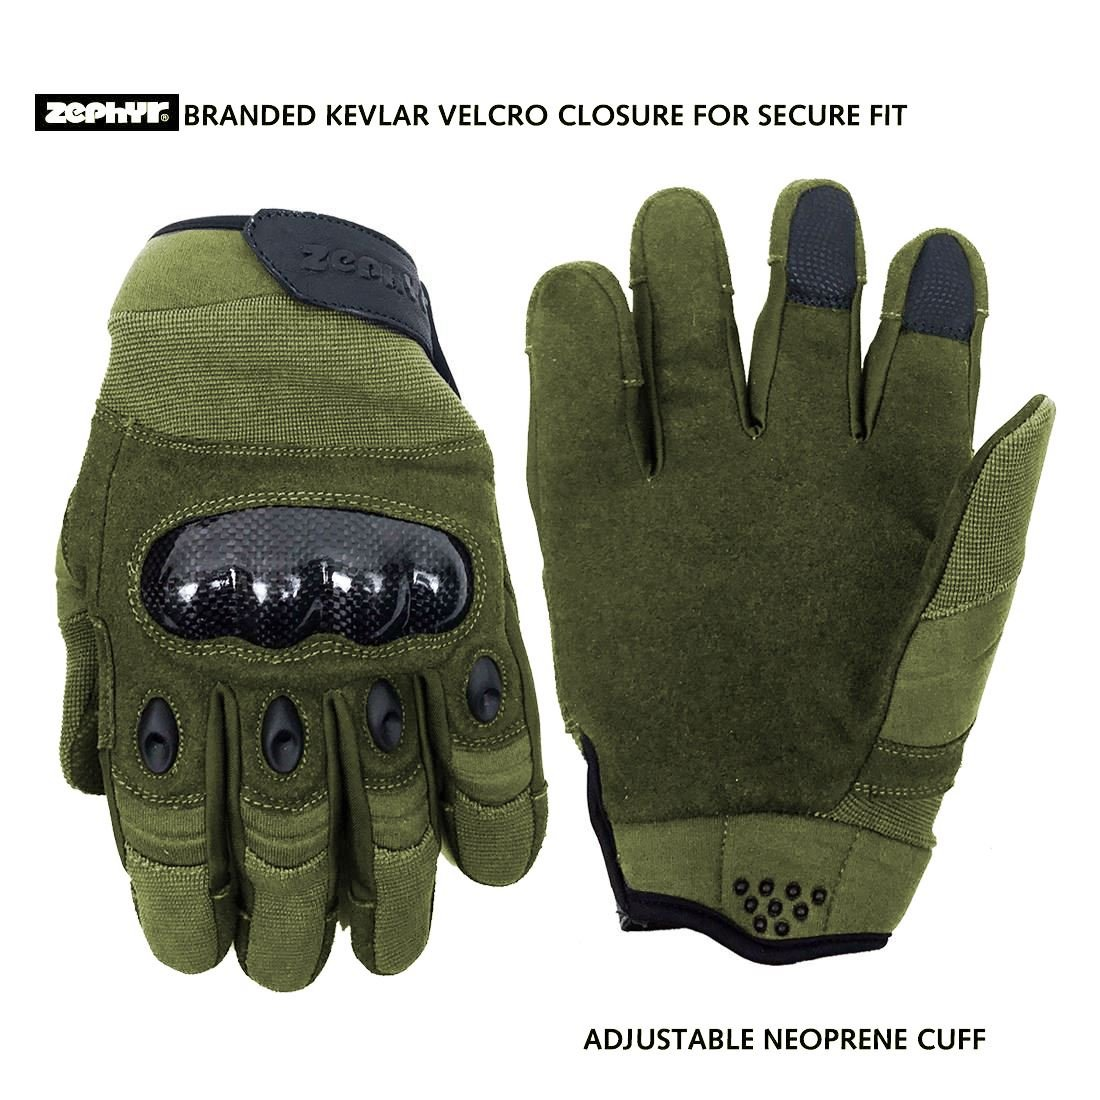 Zephyr Tactical Full Finger Carbon Fiber Knuckle Gloves w/Touchscreen Technology - Olive - Medium by Zephyr Tactical